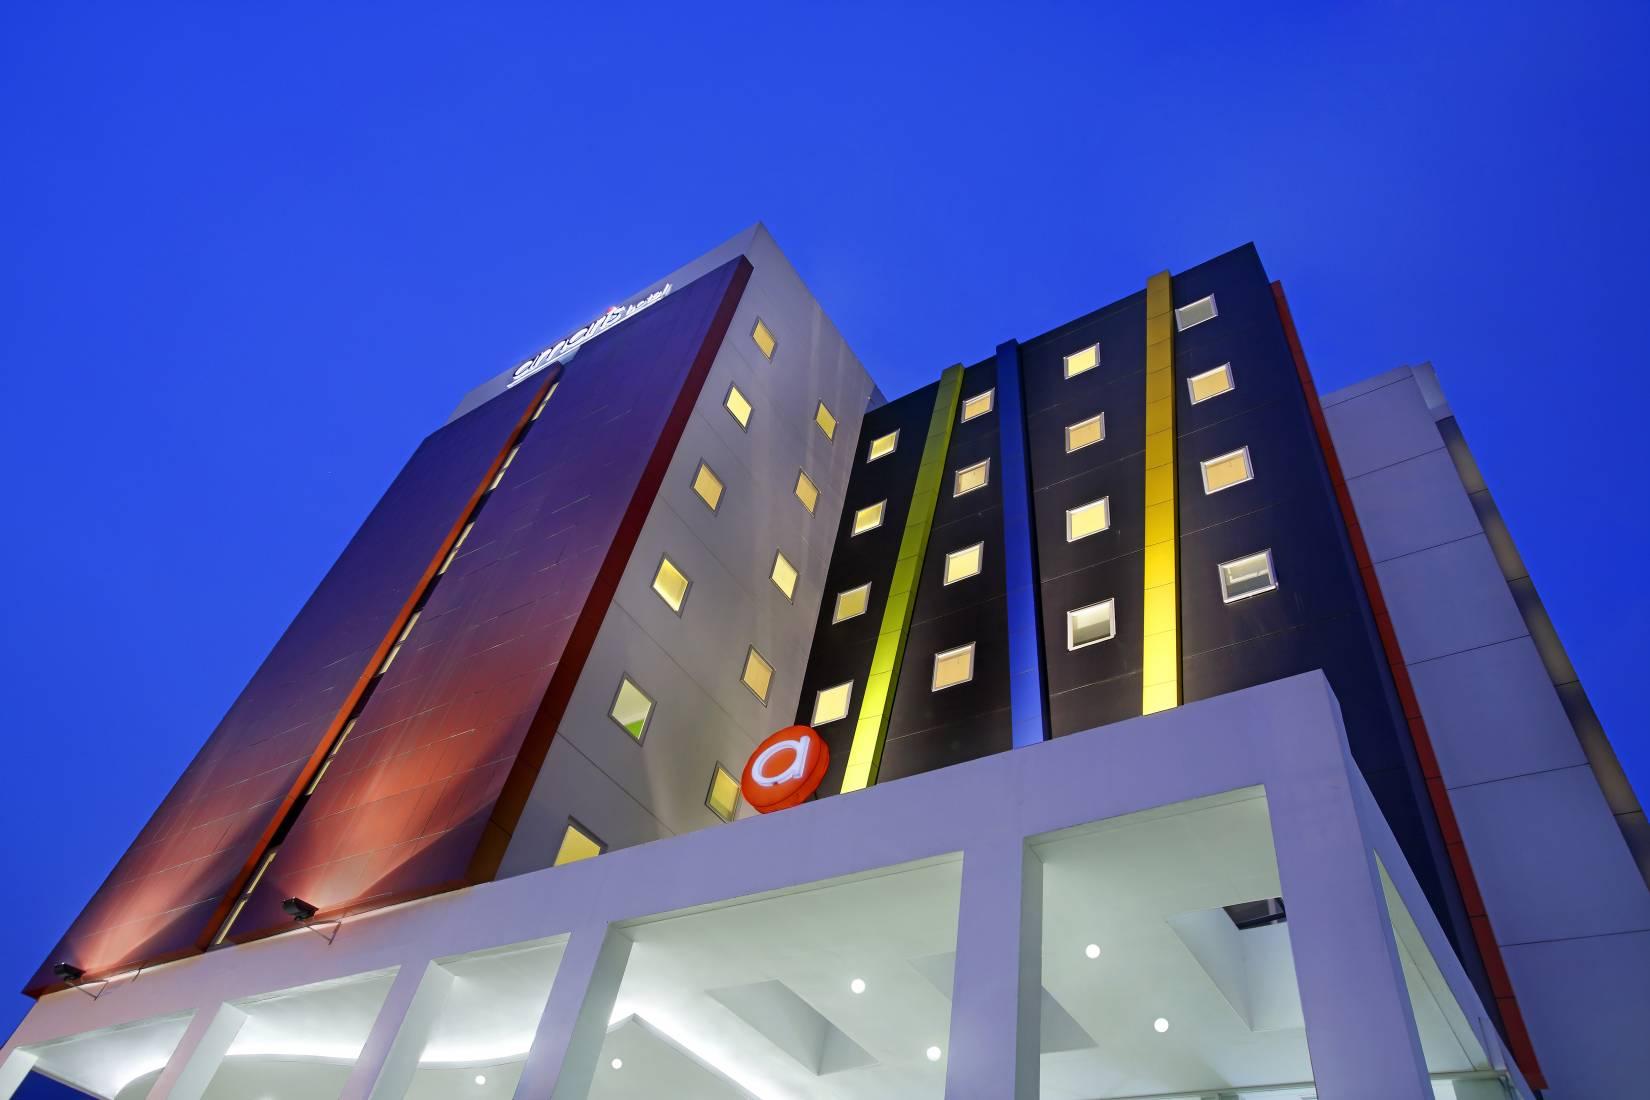 Amaris Hotel Bekasi Barat Budget Hotels Collection Voucher Carrefour Rp 15000000 With Unique Local Hospitality Value